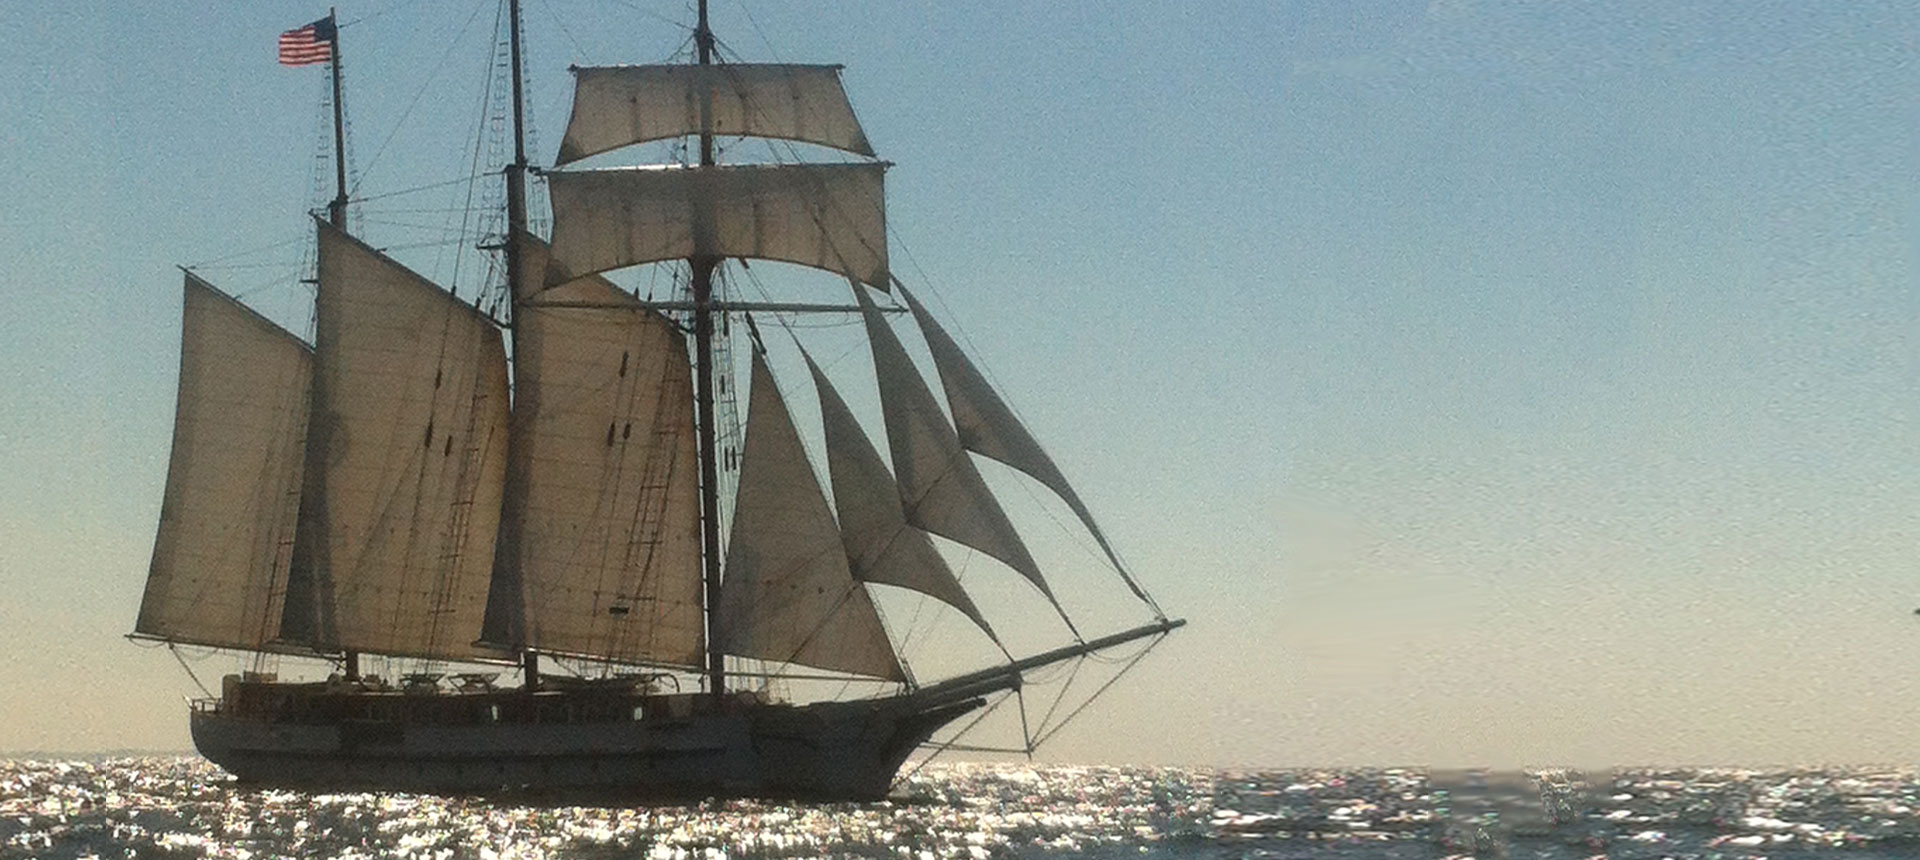 Tall Ship Schooner Mystic